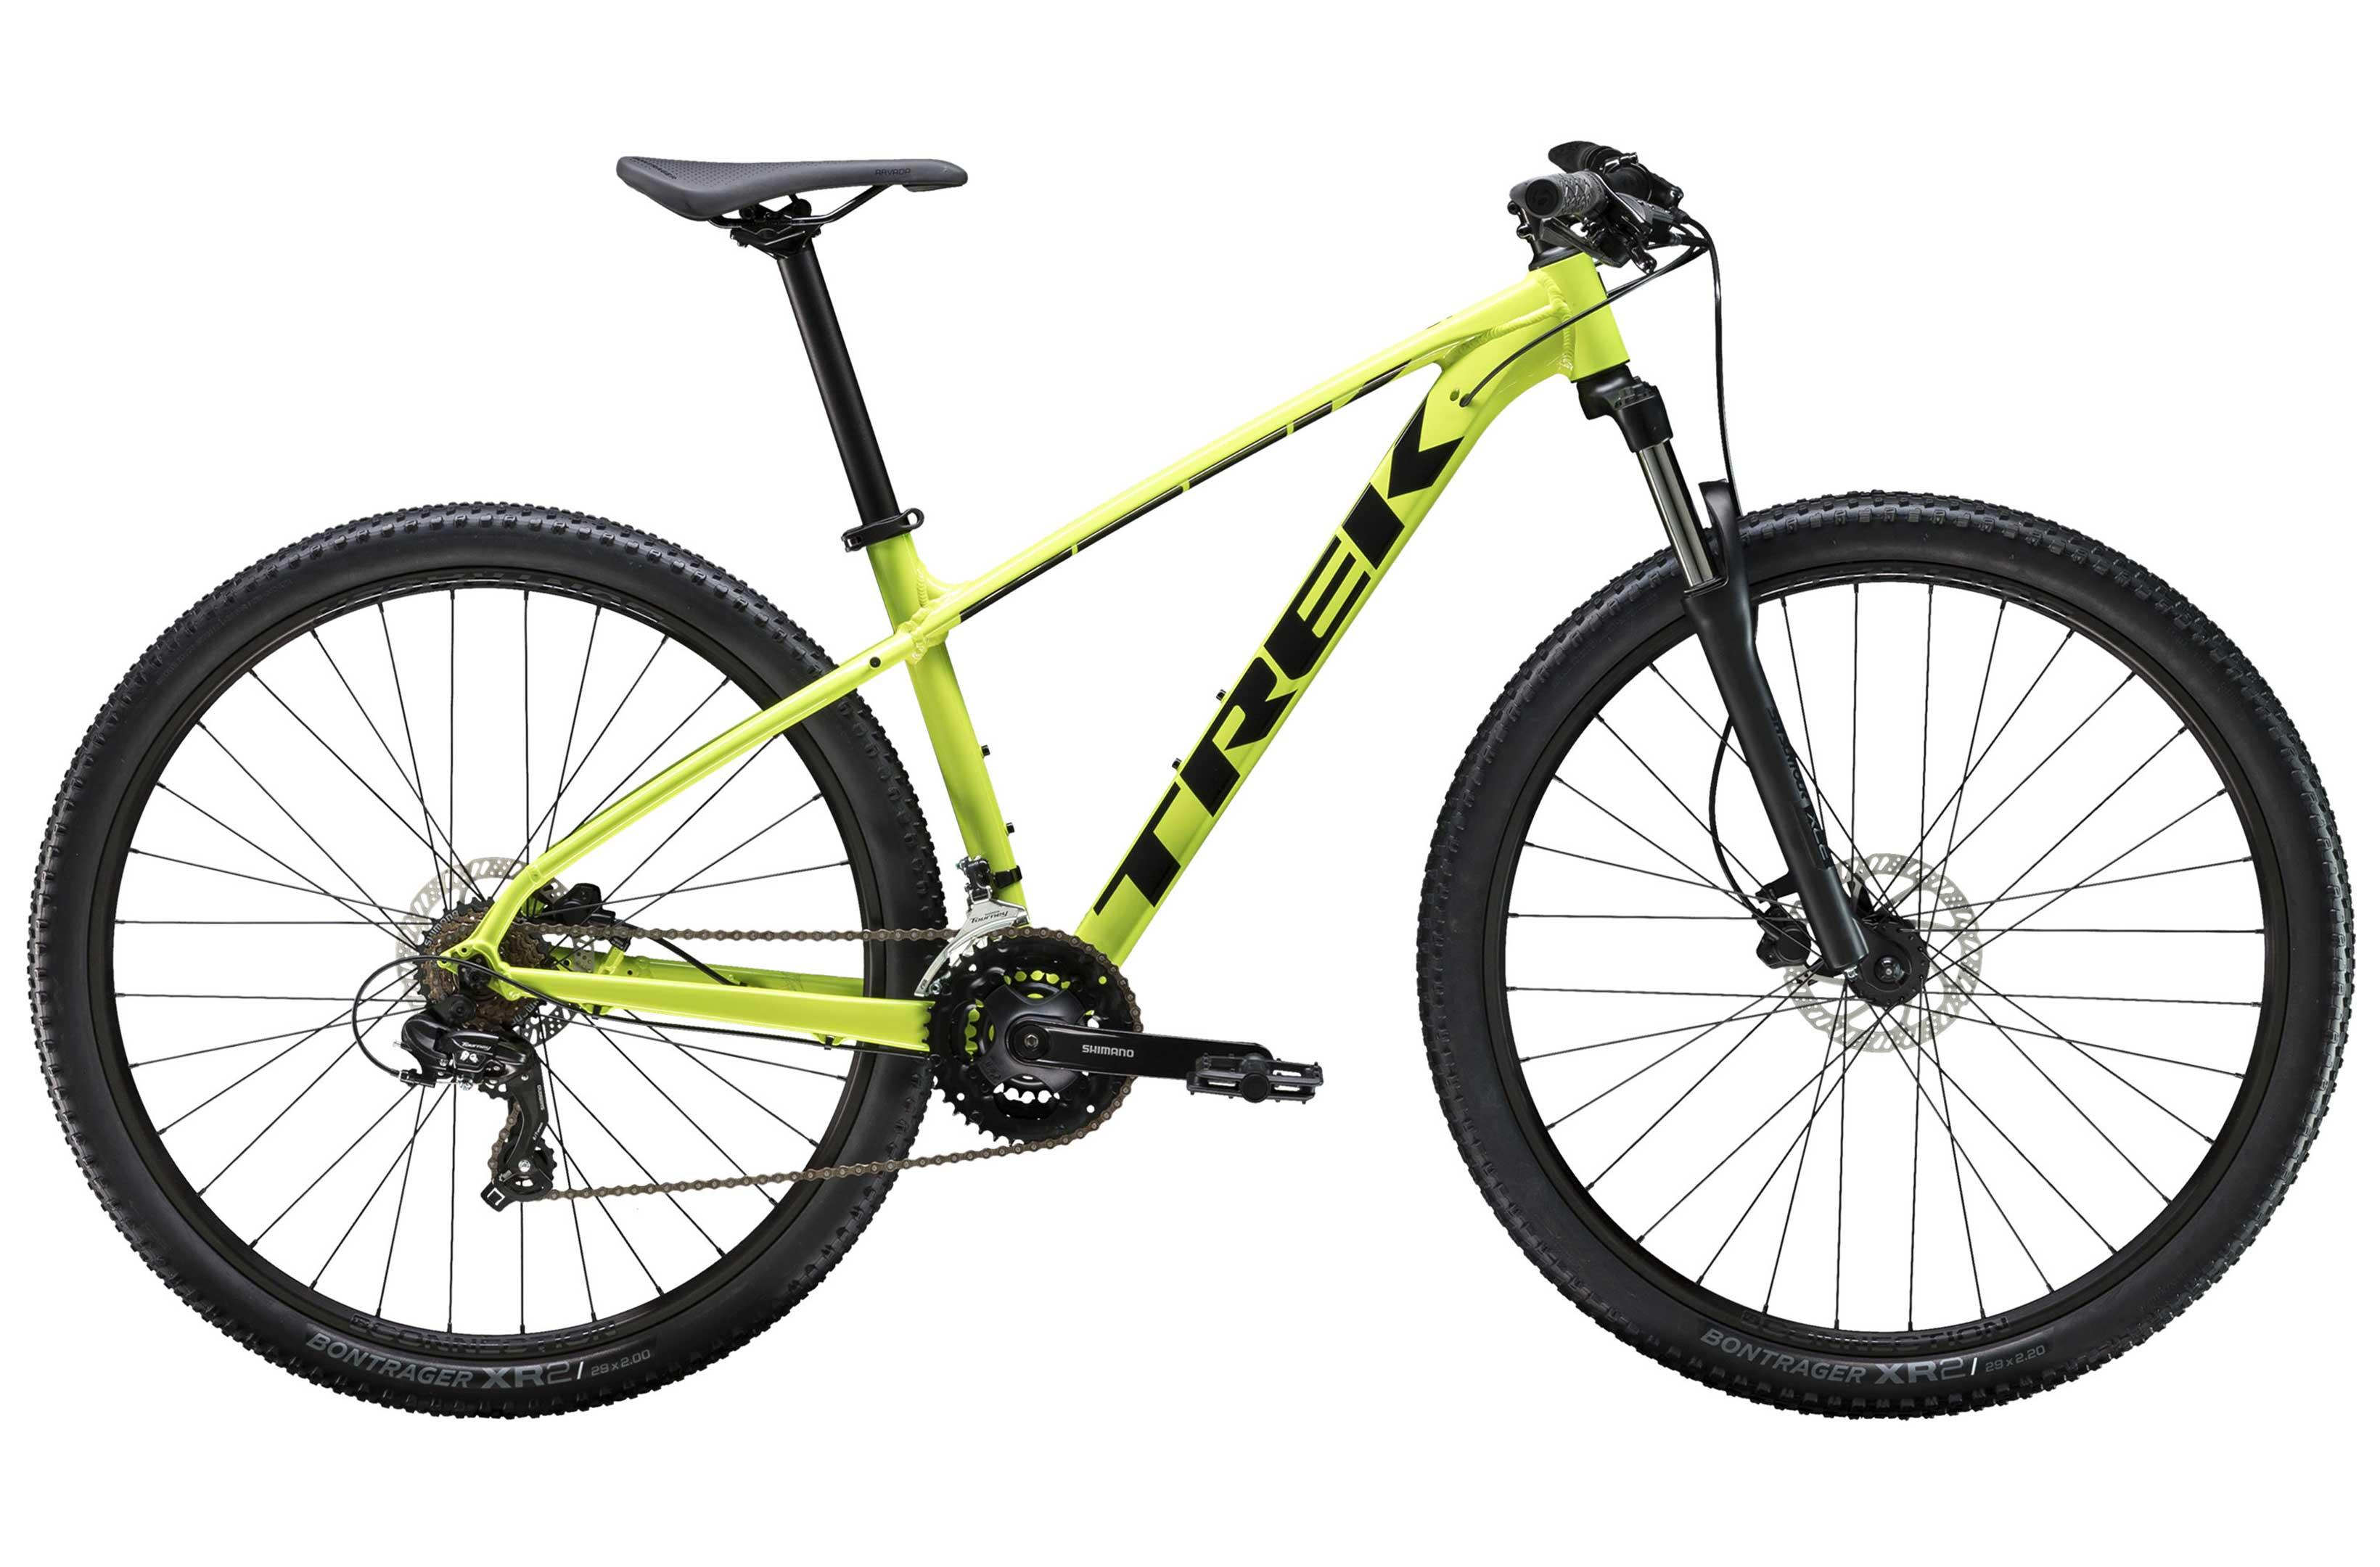 Trek Marlin 5 2019 Mountain Bike (Green, 15.5 Inch)